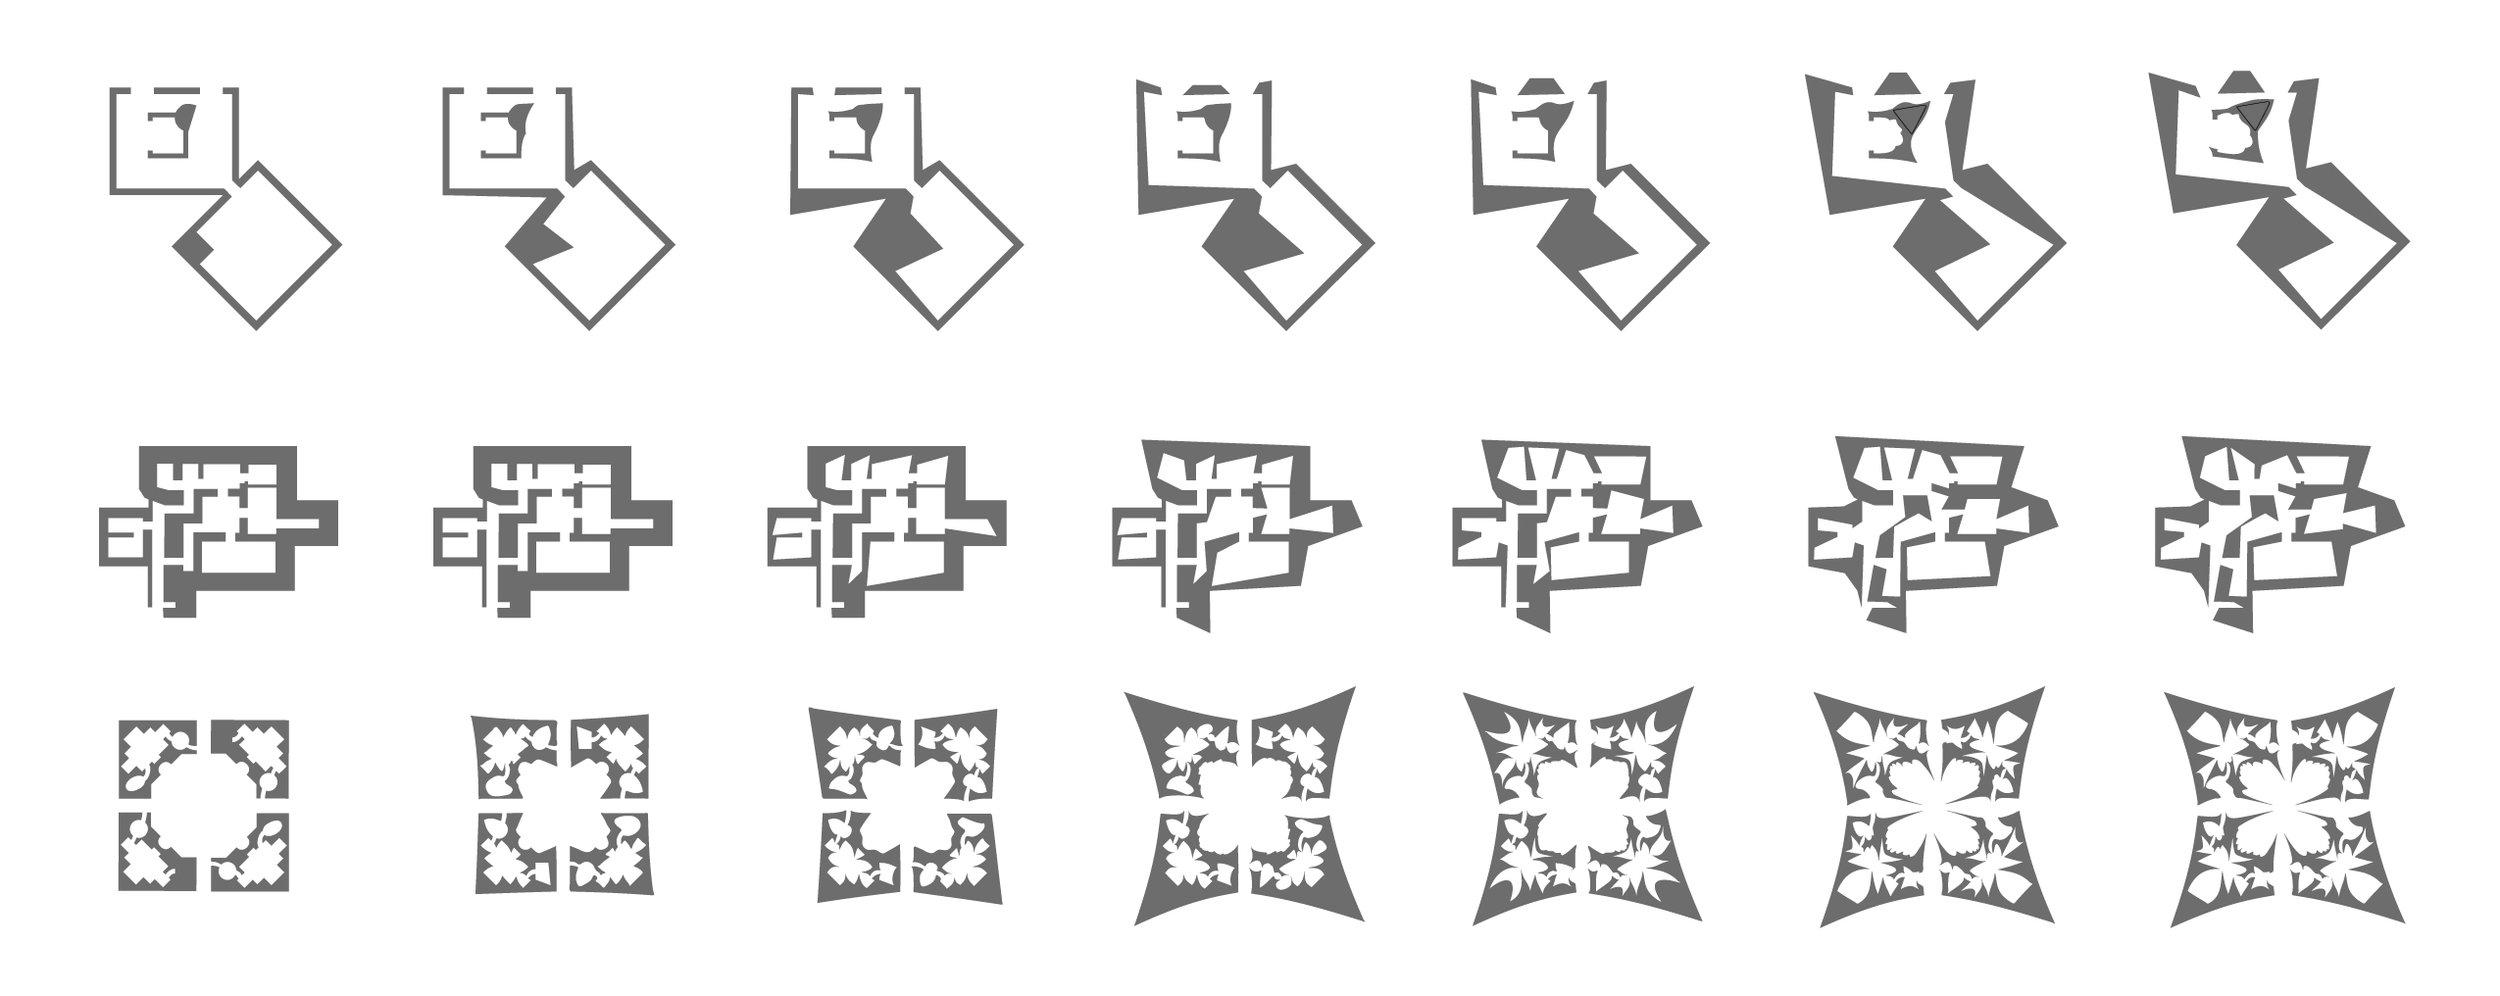 Monolith Disturbed Condensed-01.jpg